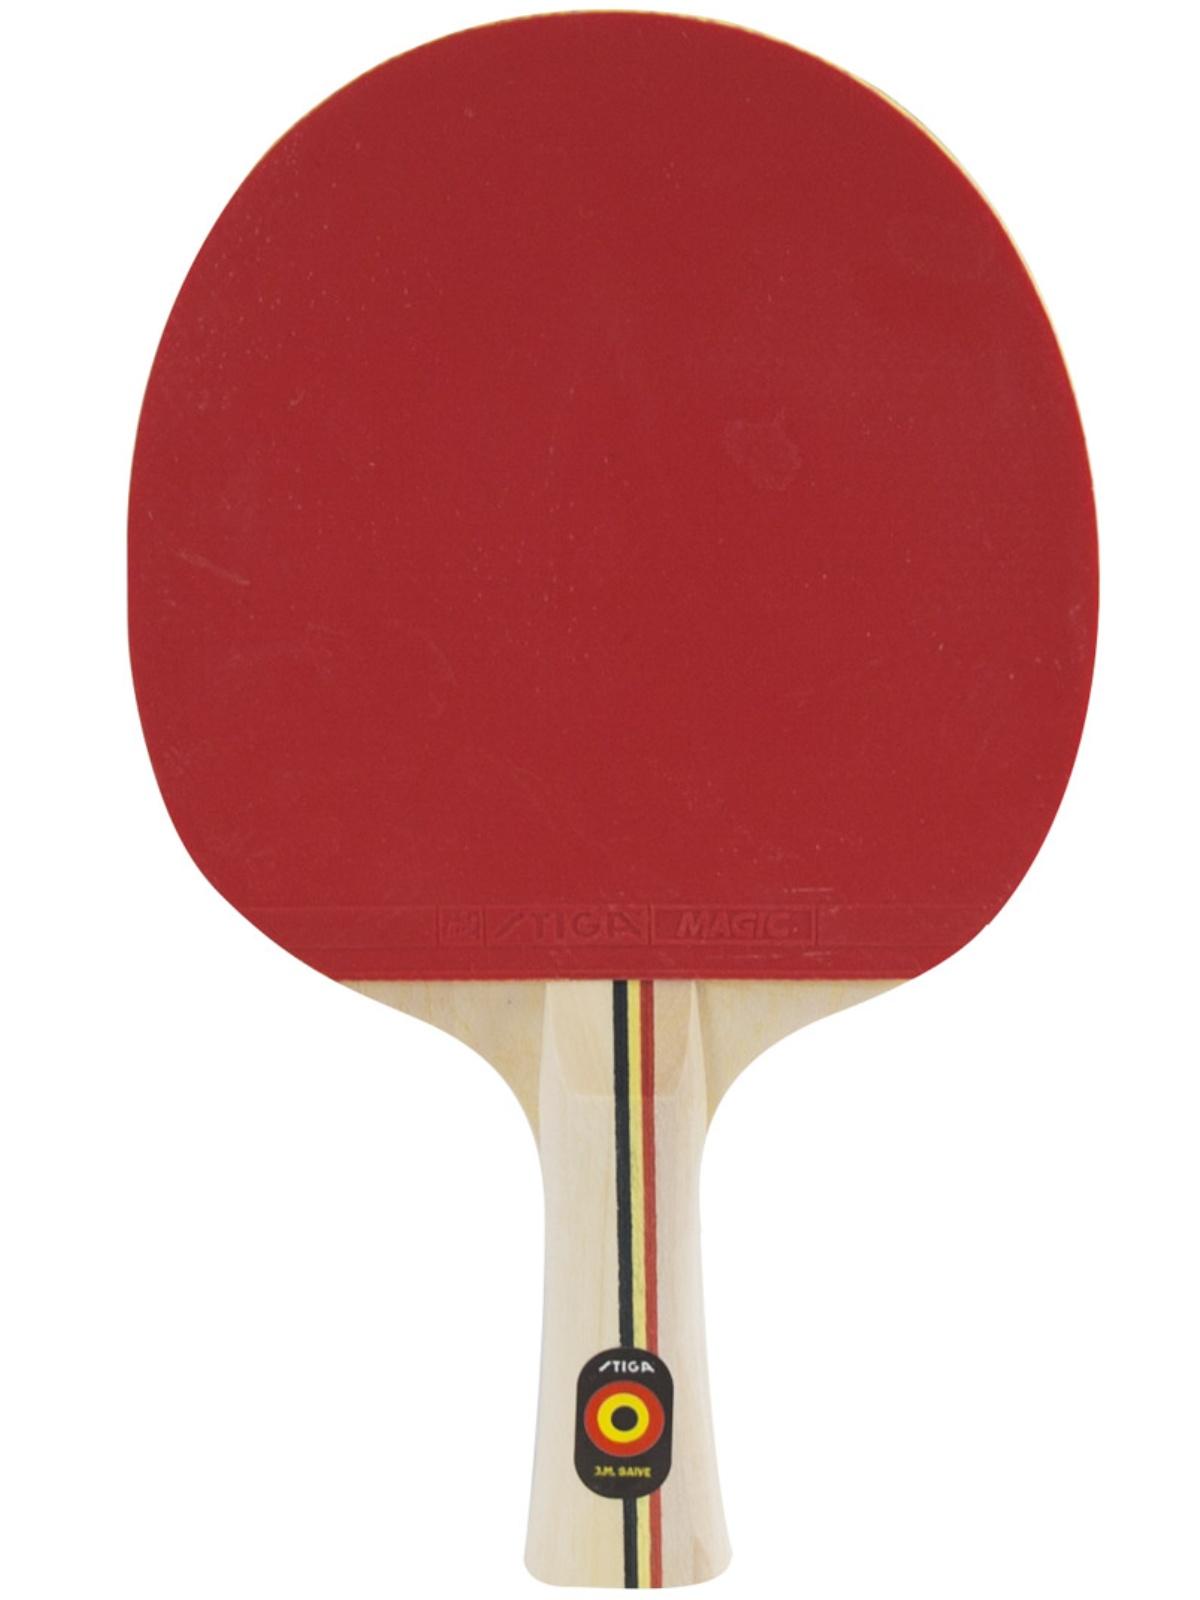 Pálka na stolní tenis STIGA Inspire Hobby